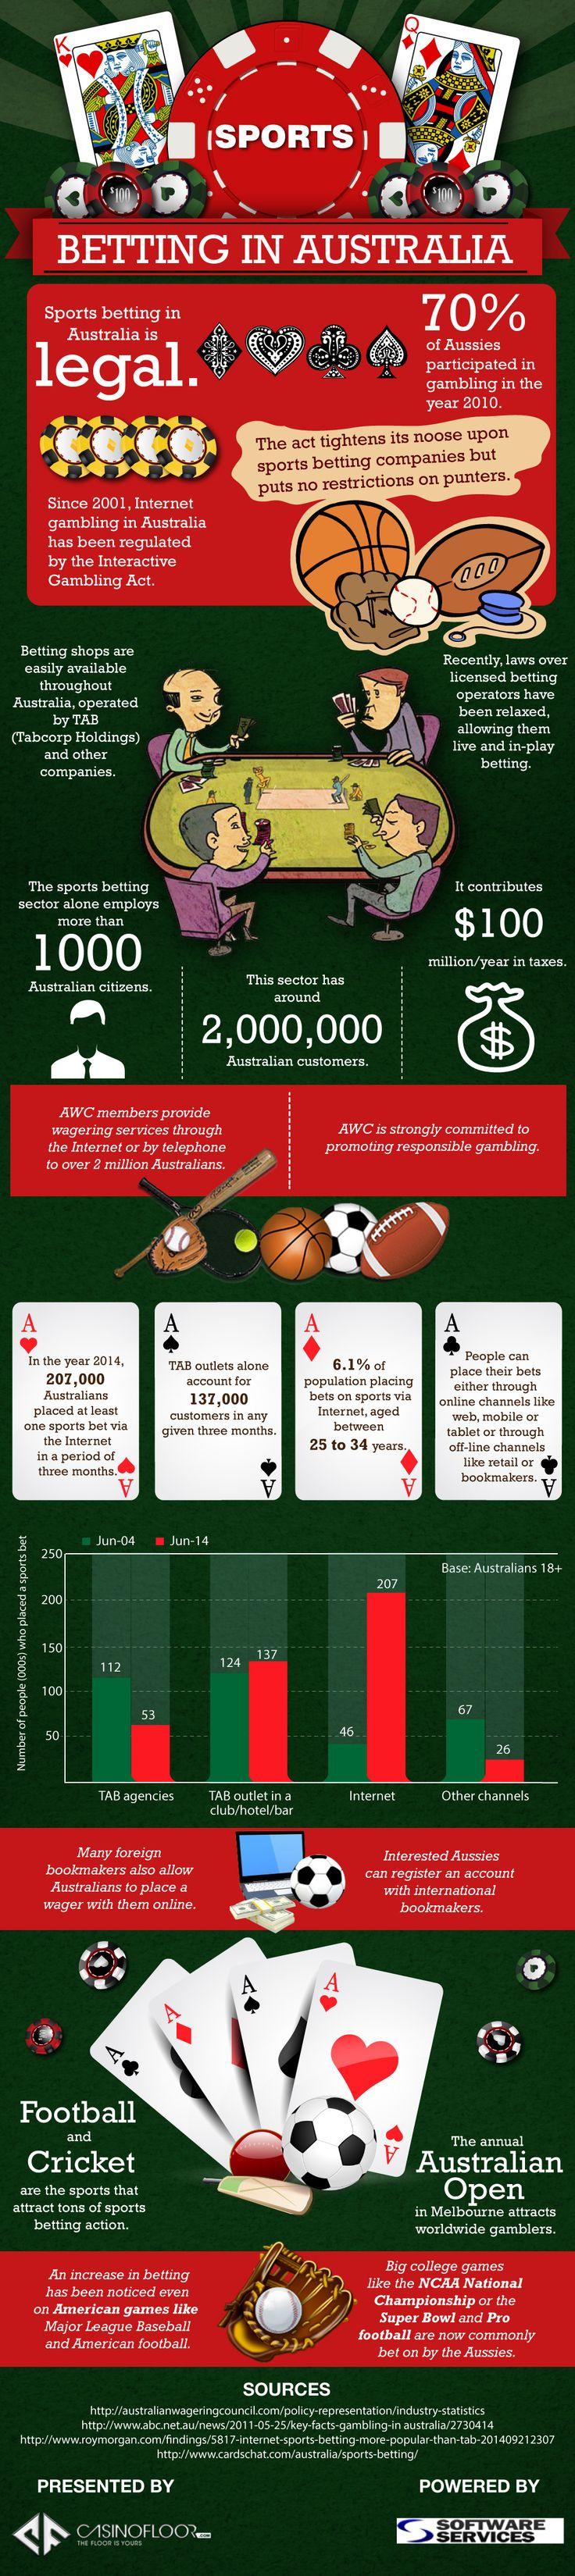 Gambling betting wide range of sports betting atlanic city casinos